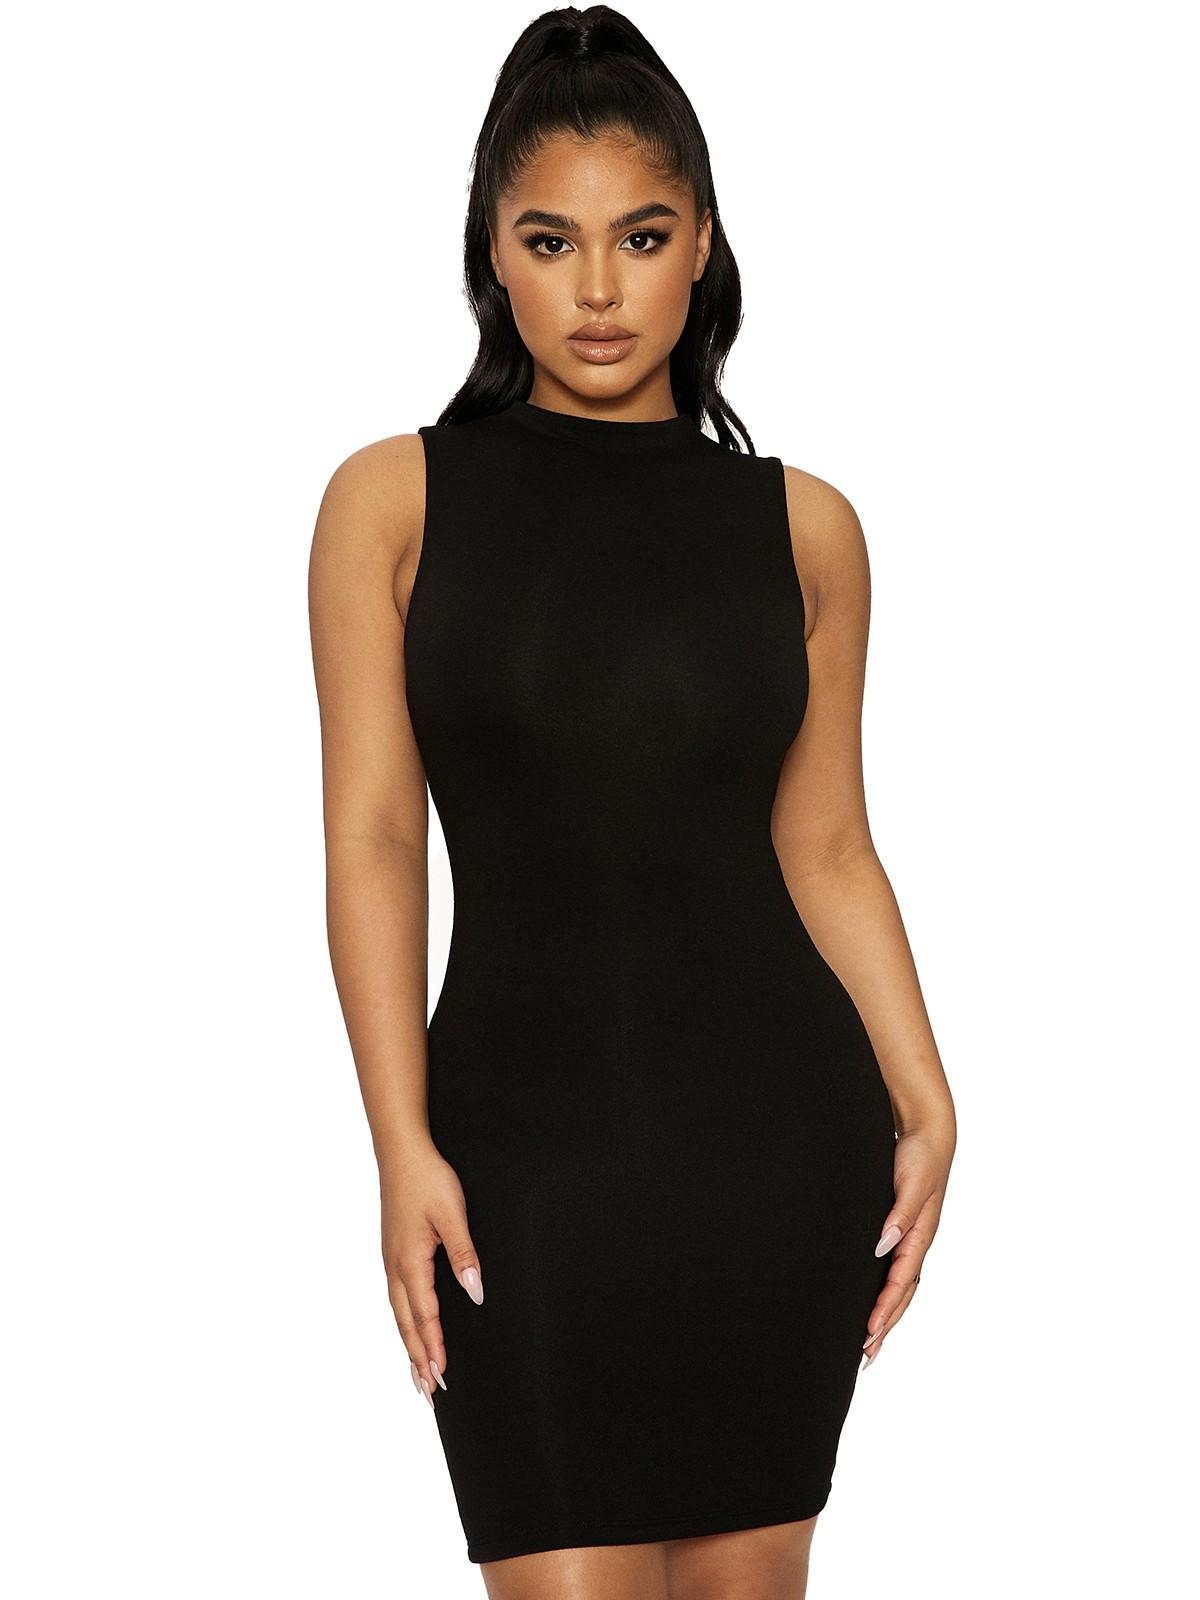 The NW Sleeveless Mini Dress by Naked Wardrobe, available on nakedwardrobe.com for $46 Kylie Jenner Dress SIMILAR PRODUCT